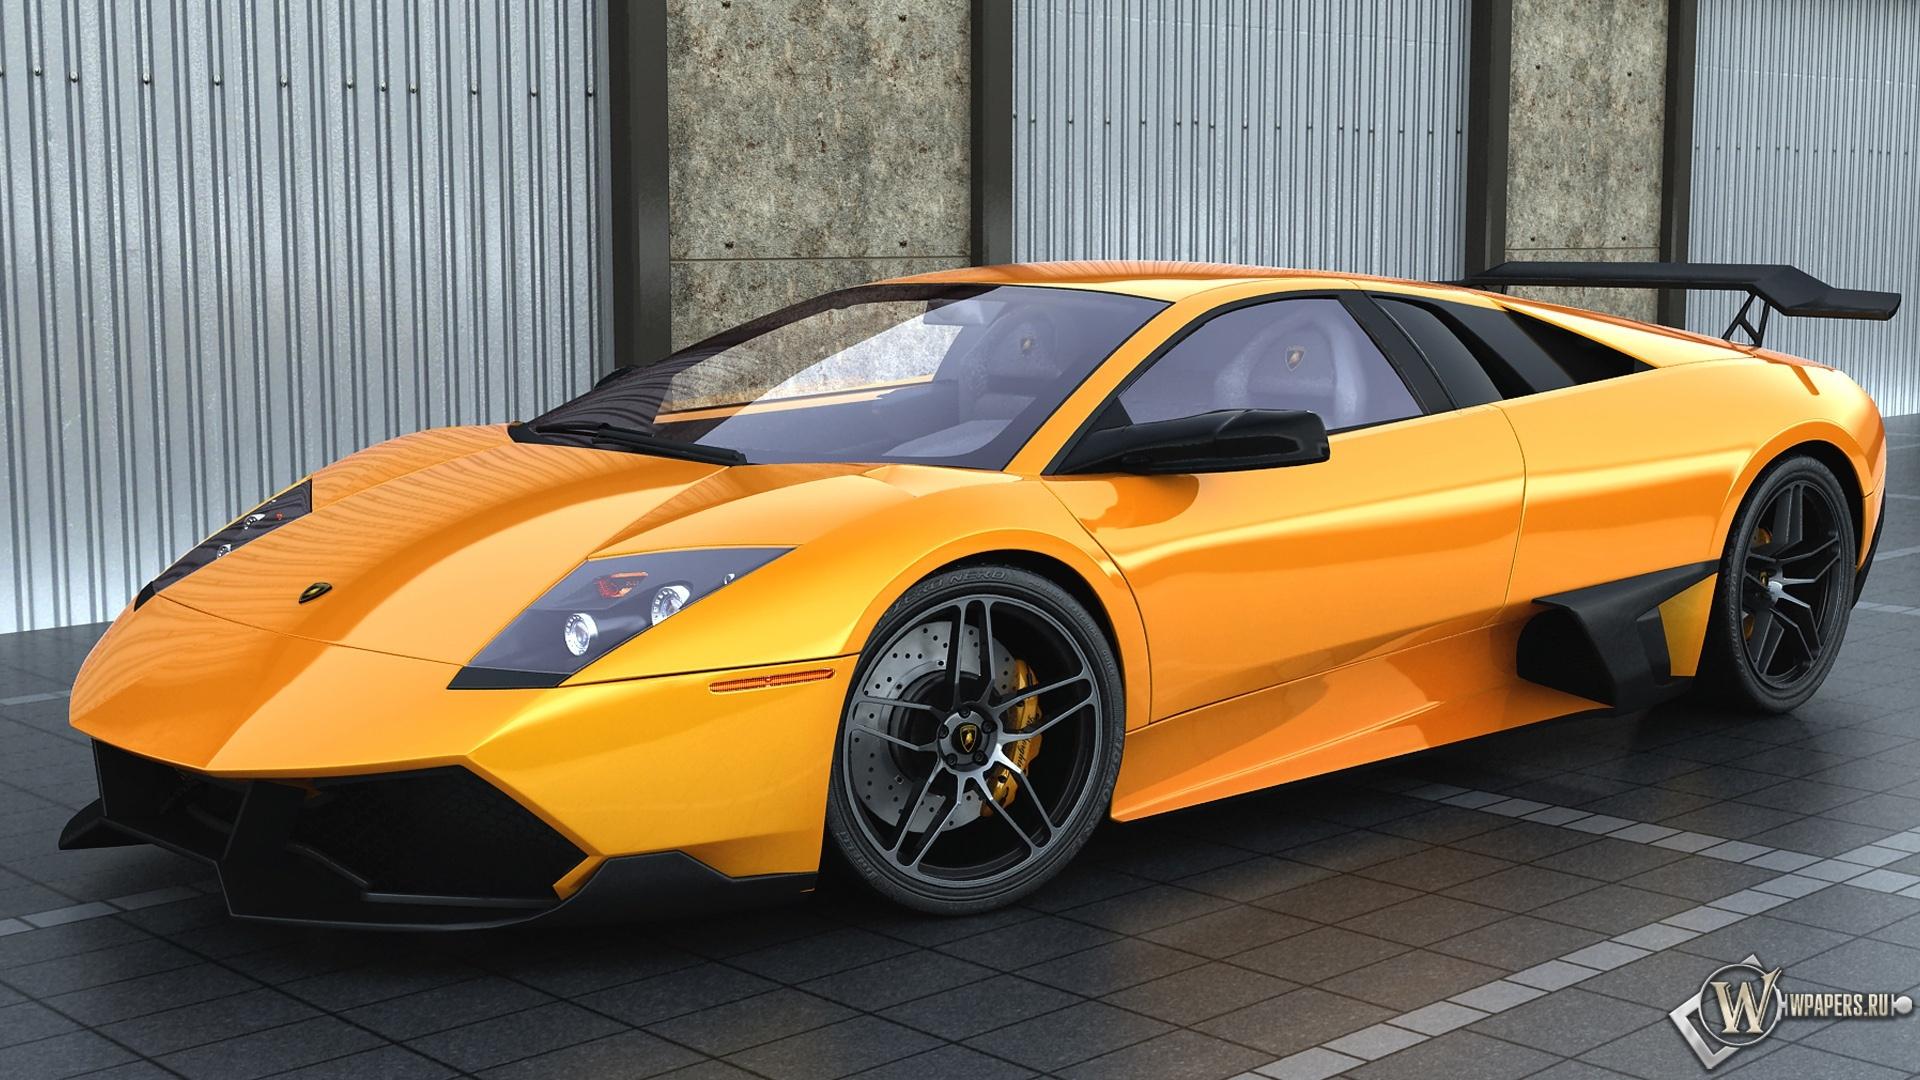 Скачать обои Lamborghini Lamborghini Оранжевый для